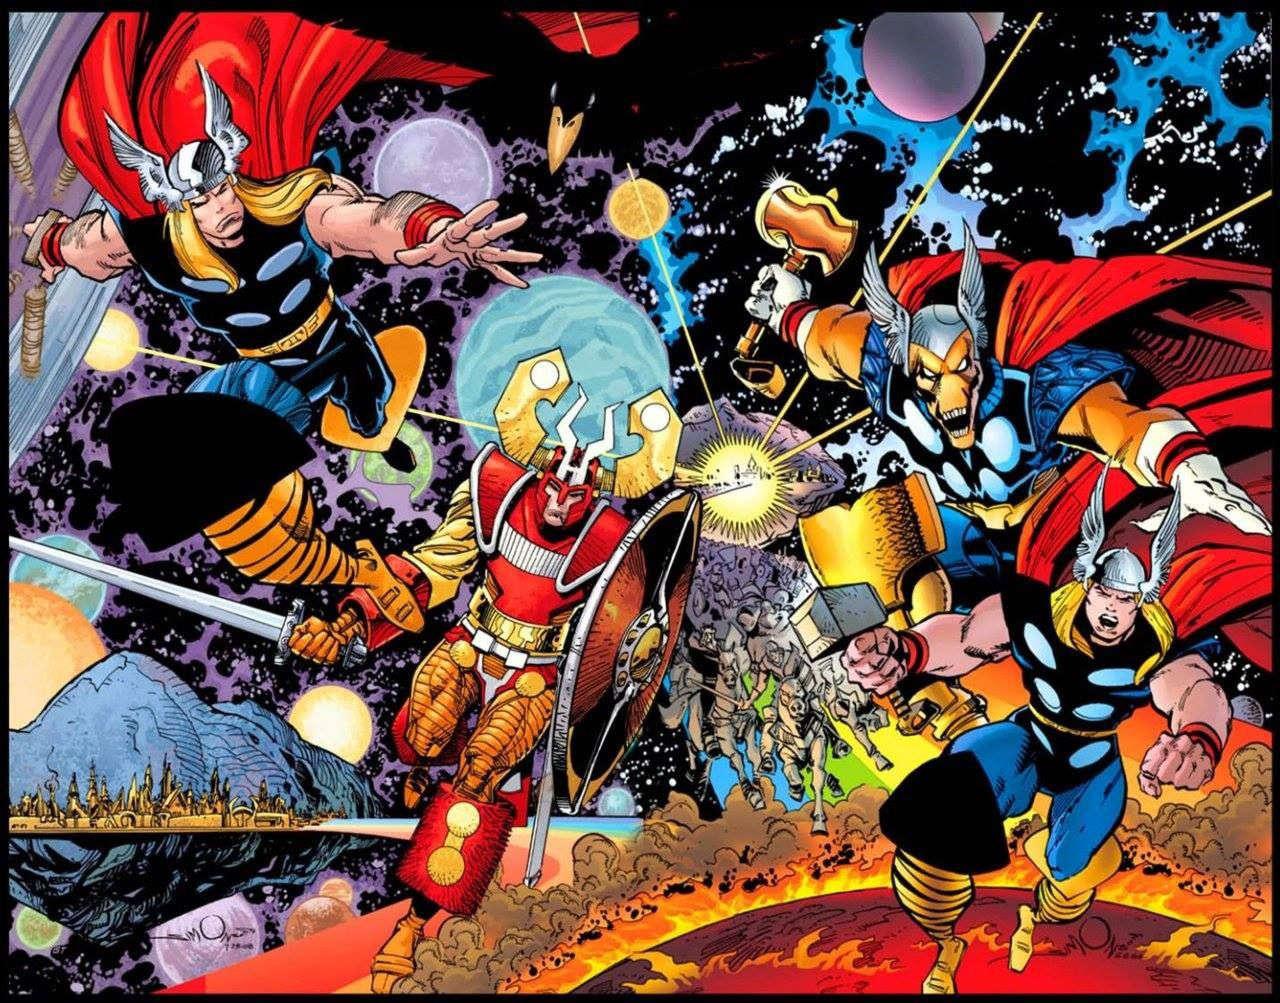 Comic Book Artist: Walter Simonson